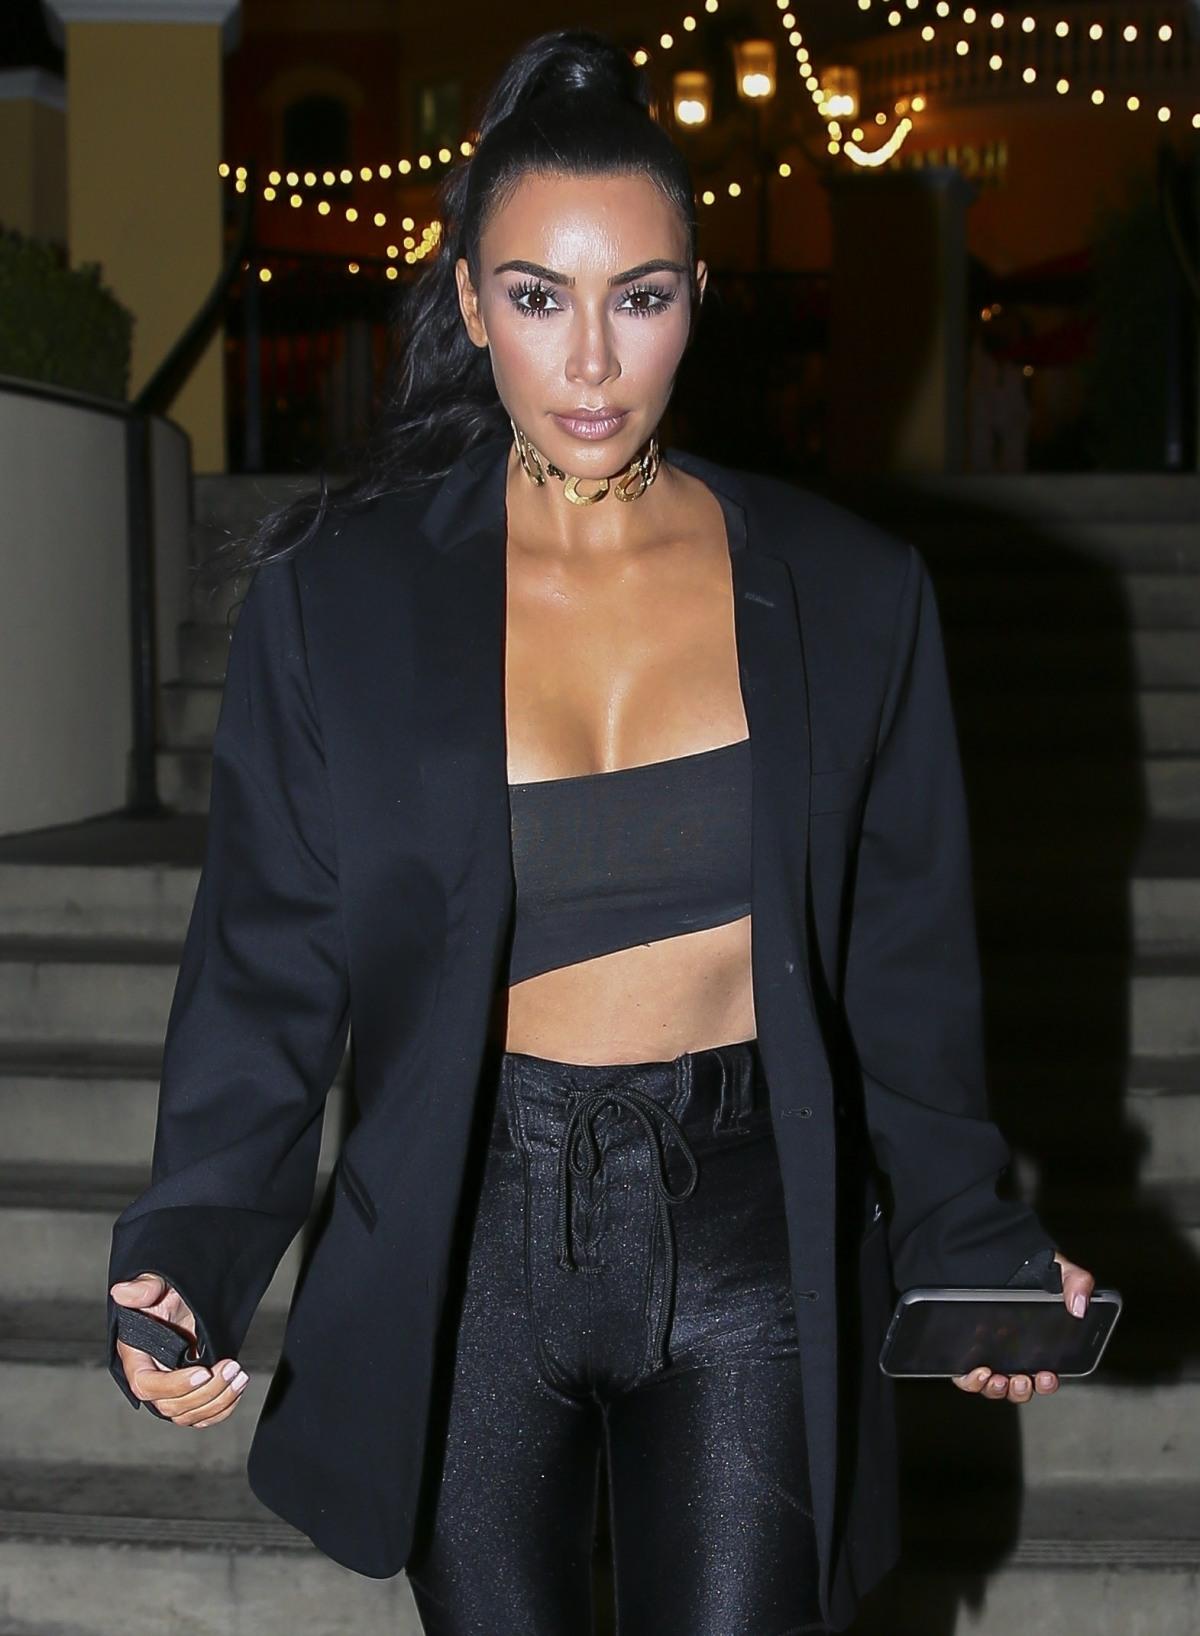 Kim Kardashian scoppia dalla sua top dopo sushi a Sugarfish